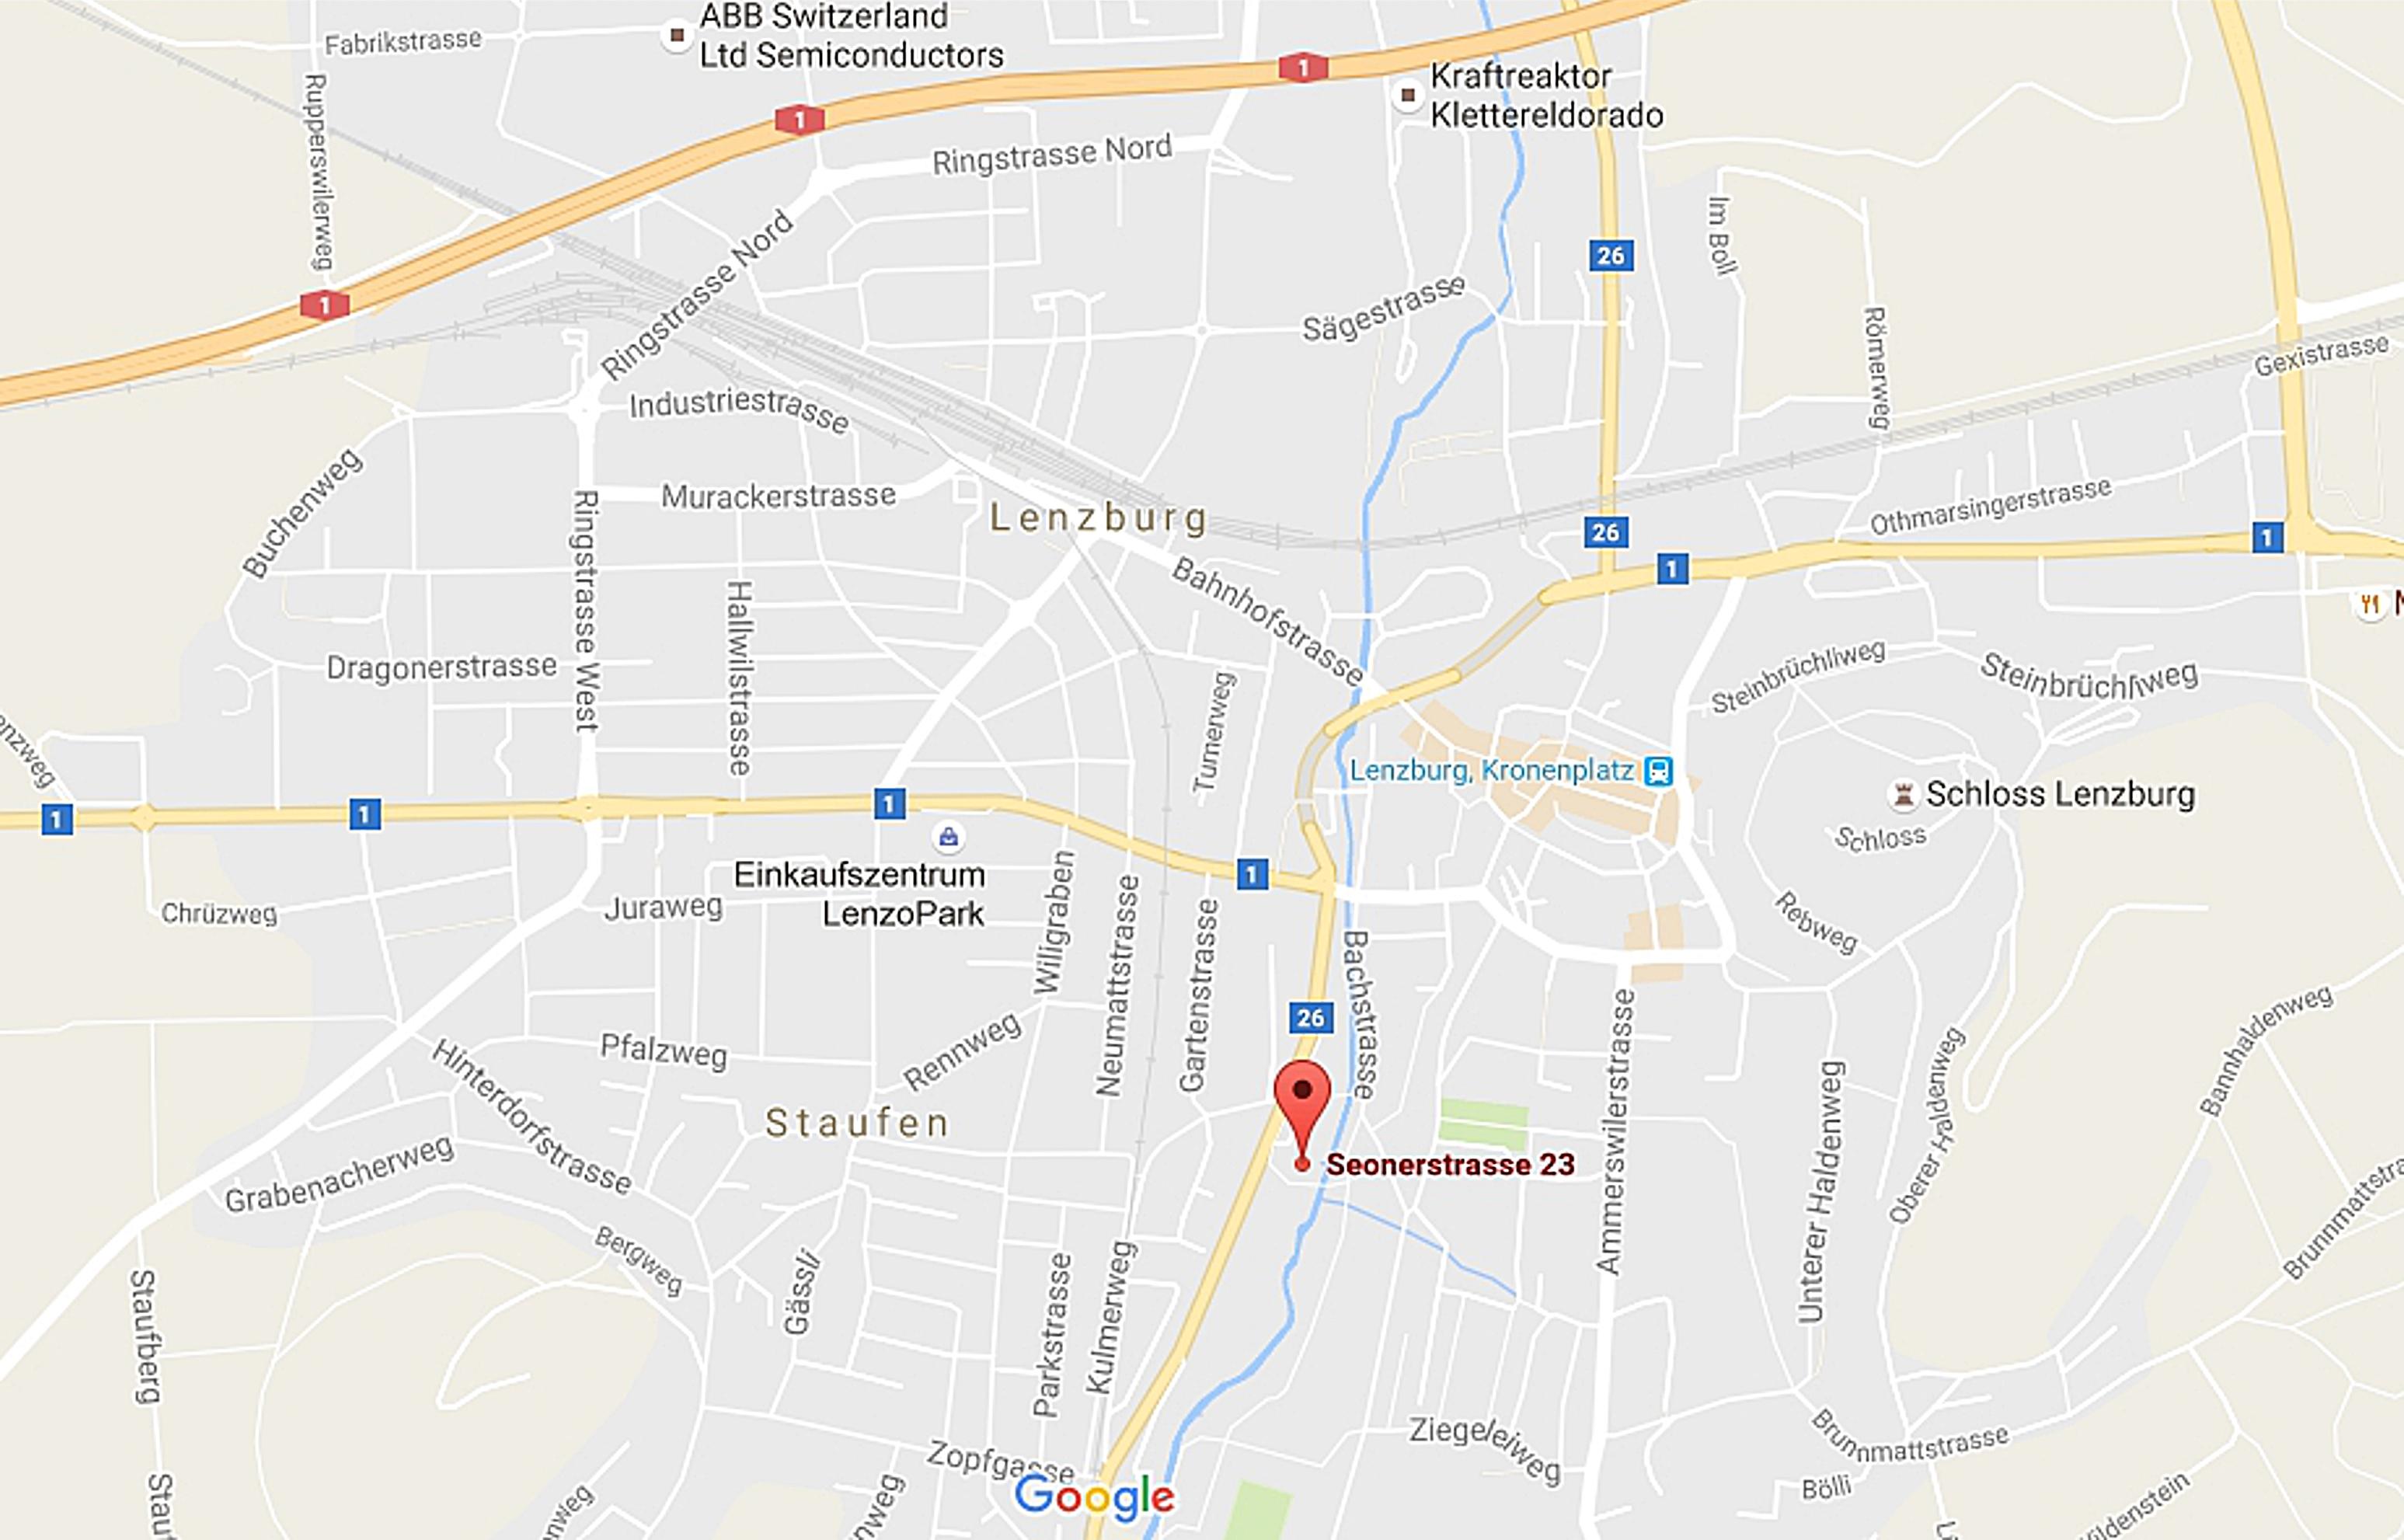 Lenzburg Seonerstr. 23, Tommasini_